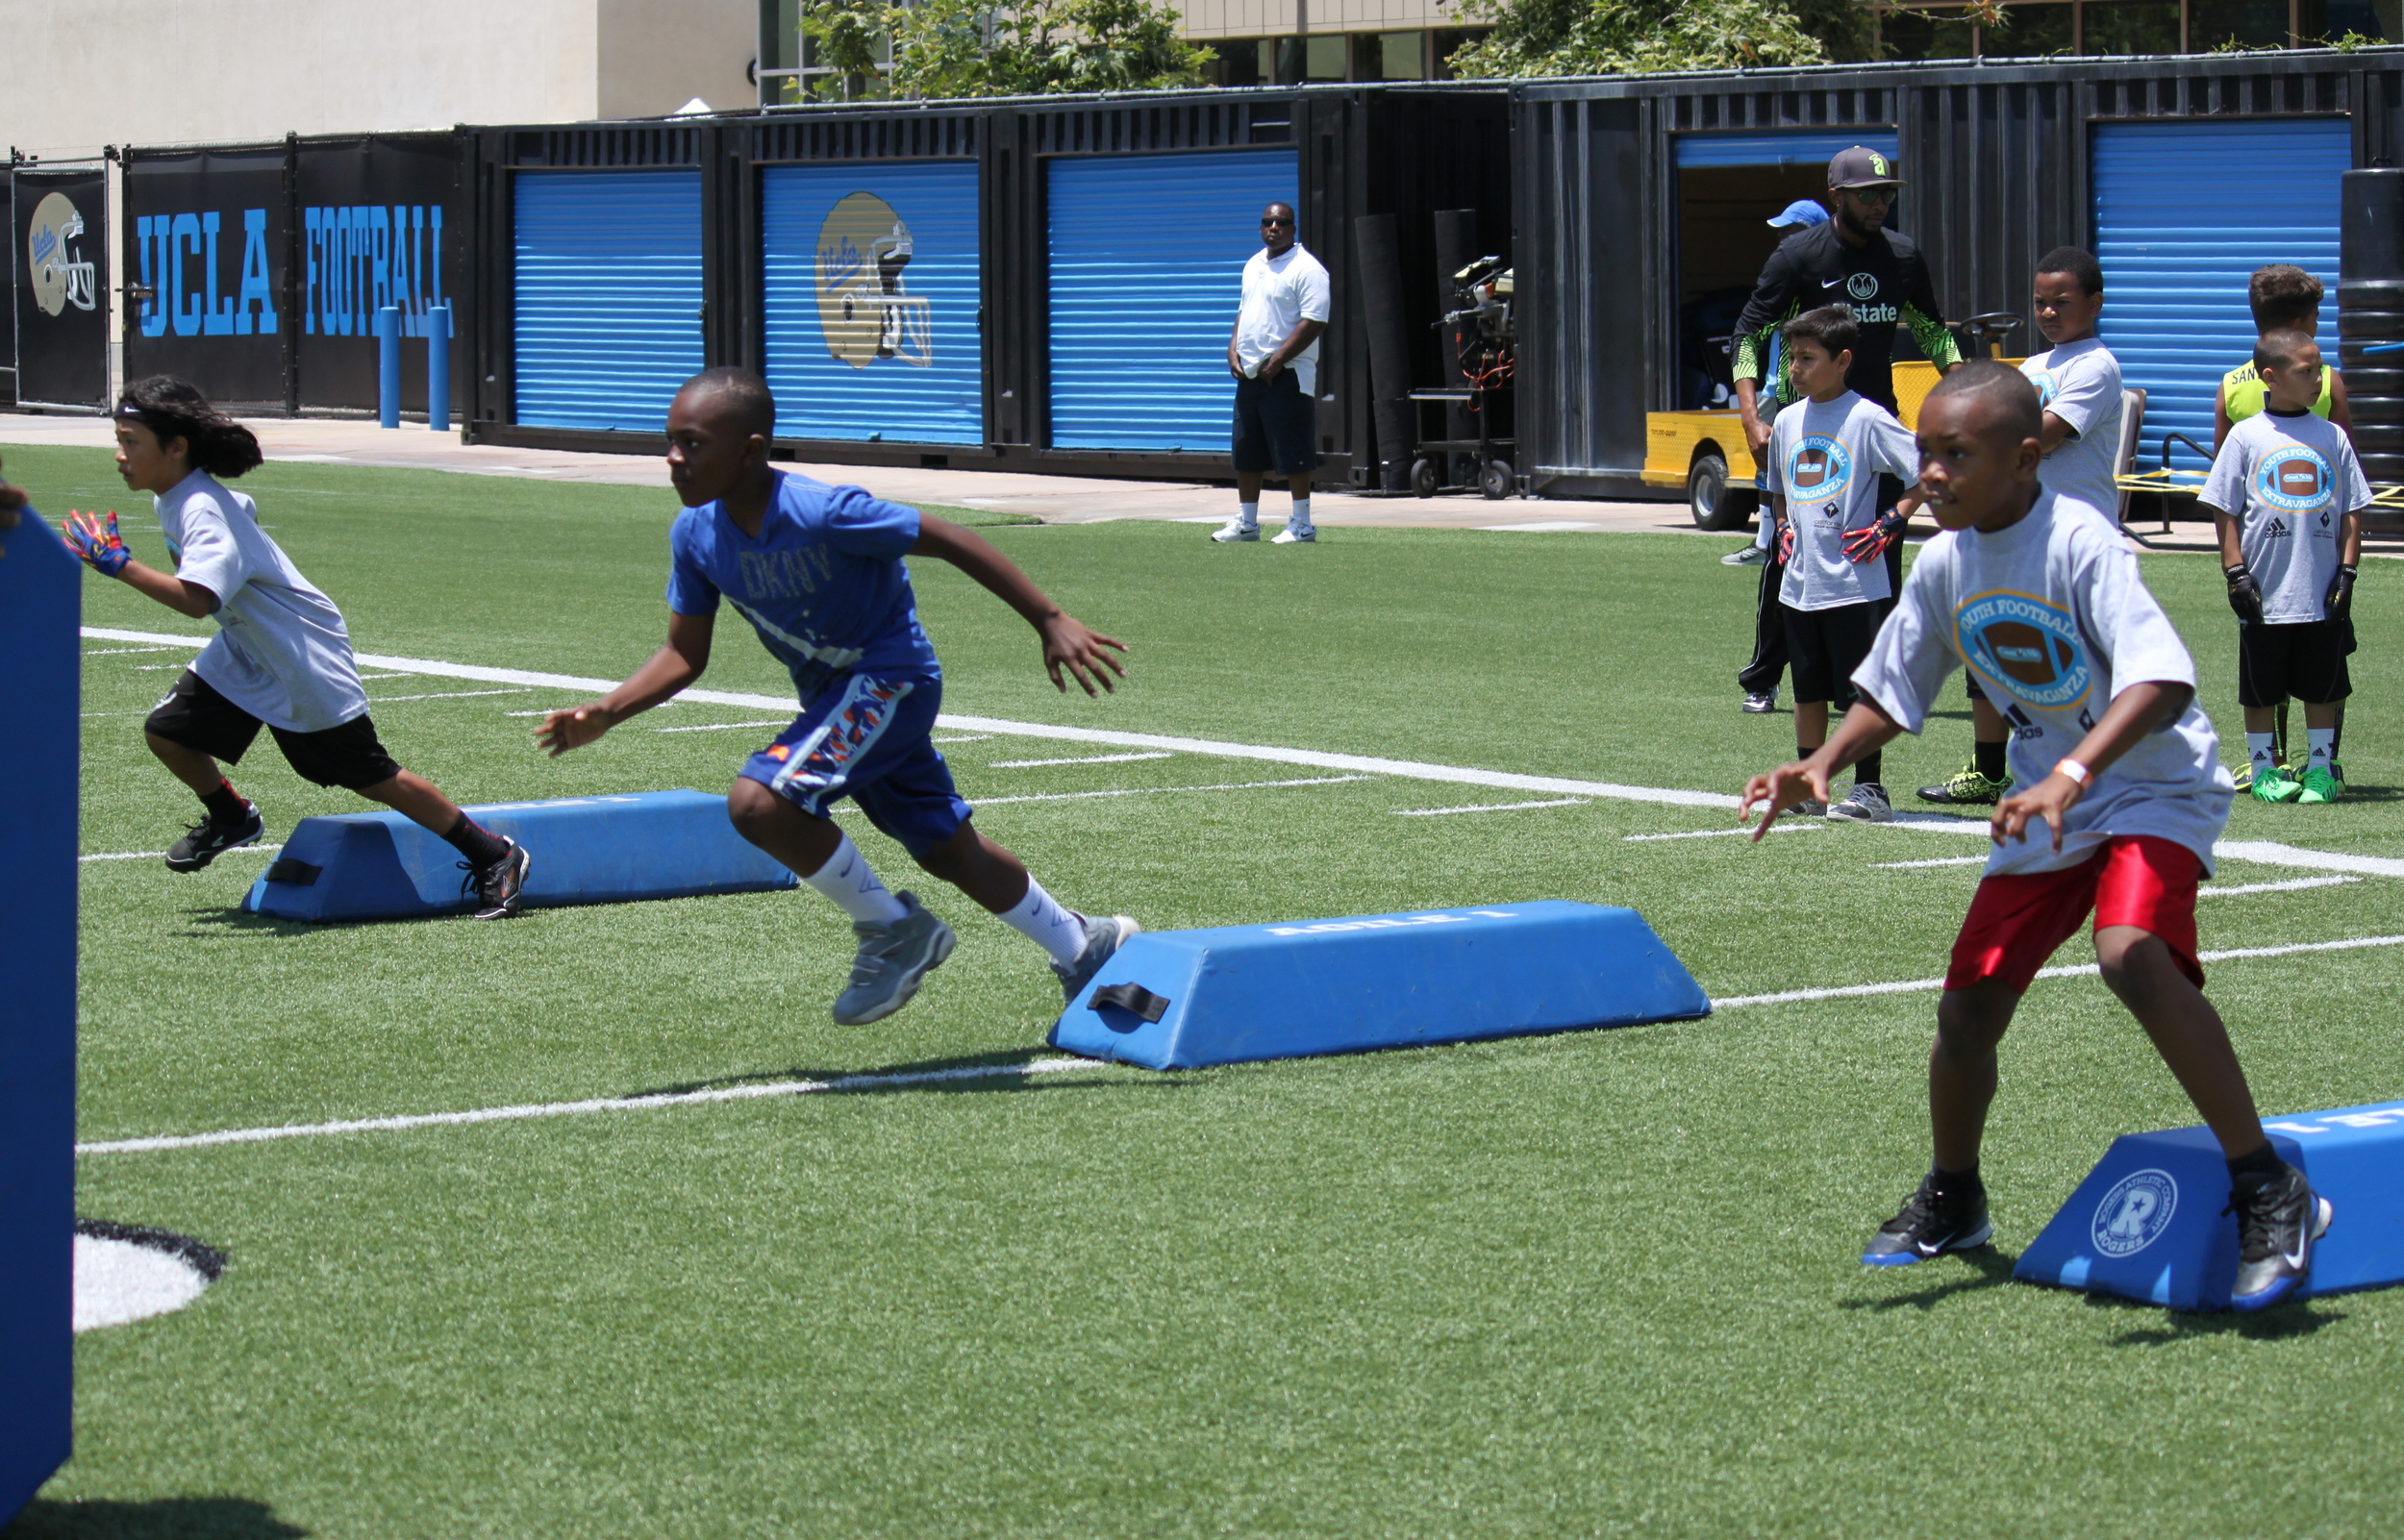 YES kids on field.JPG